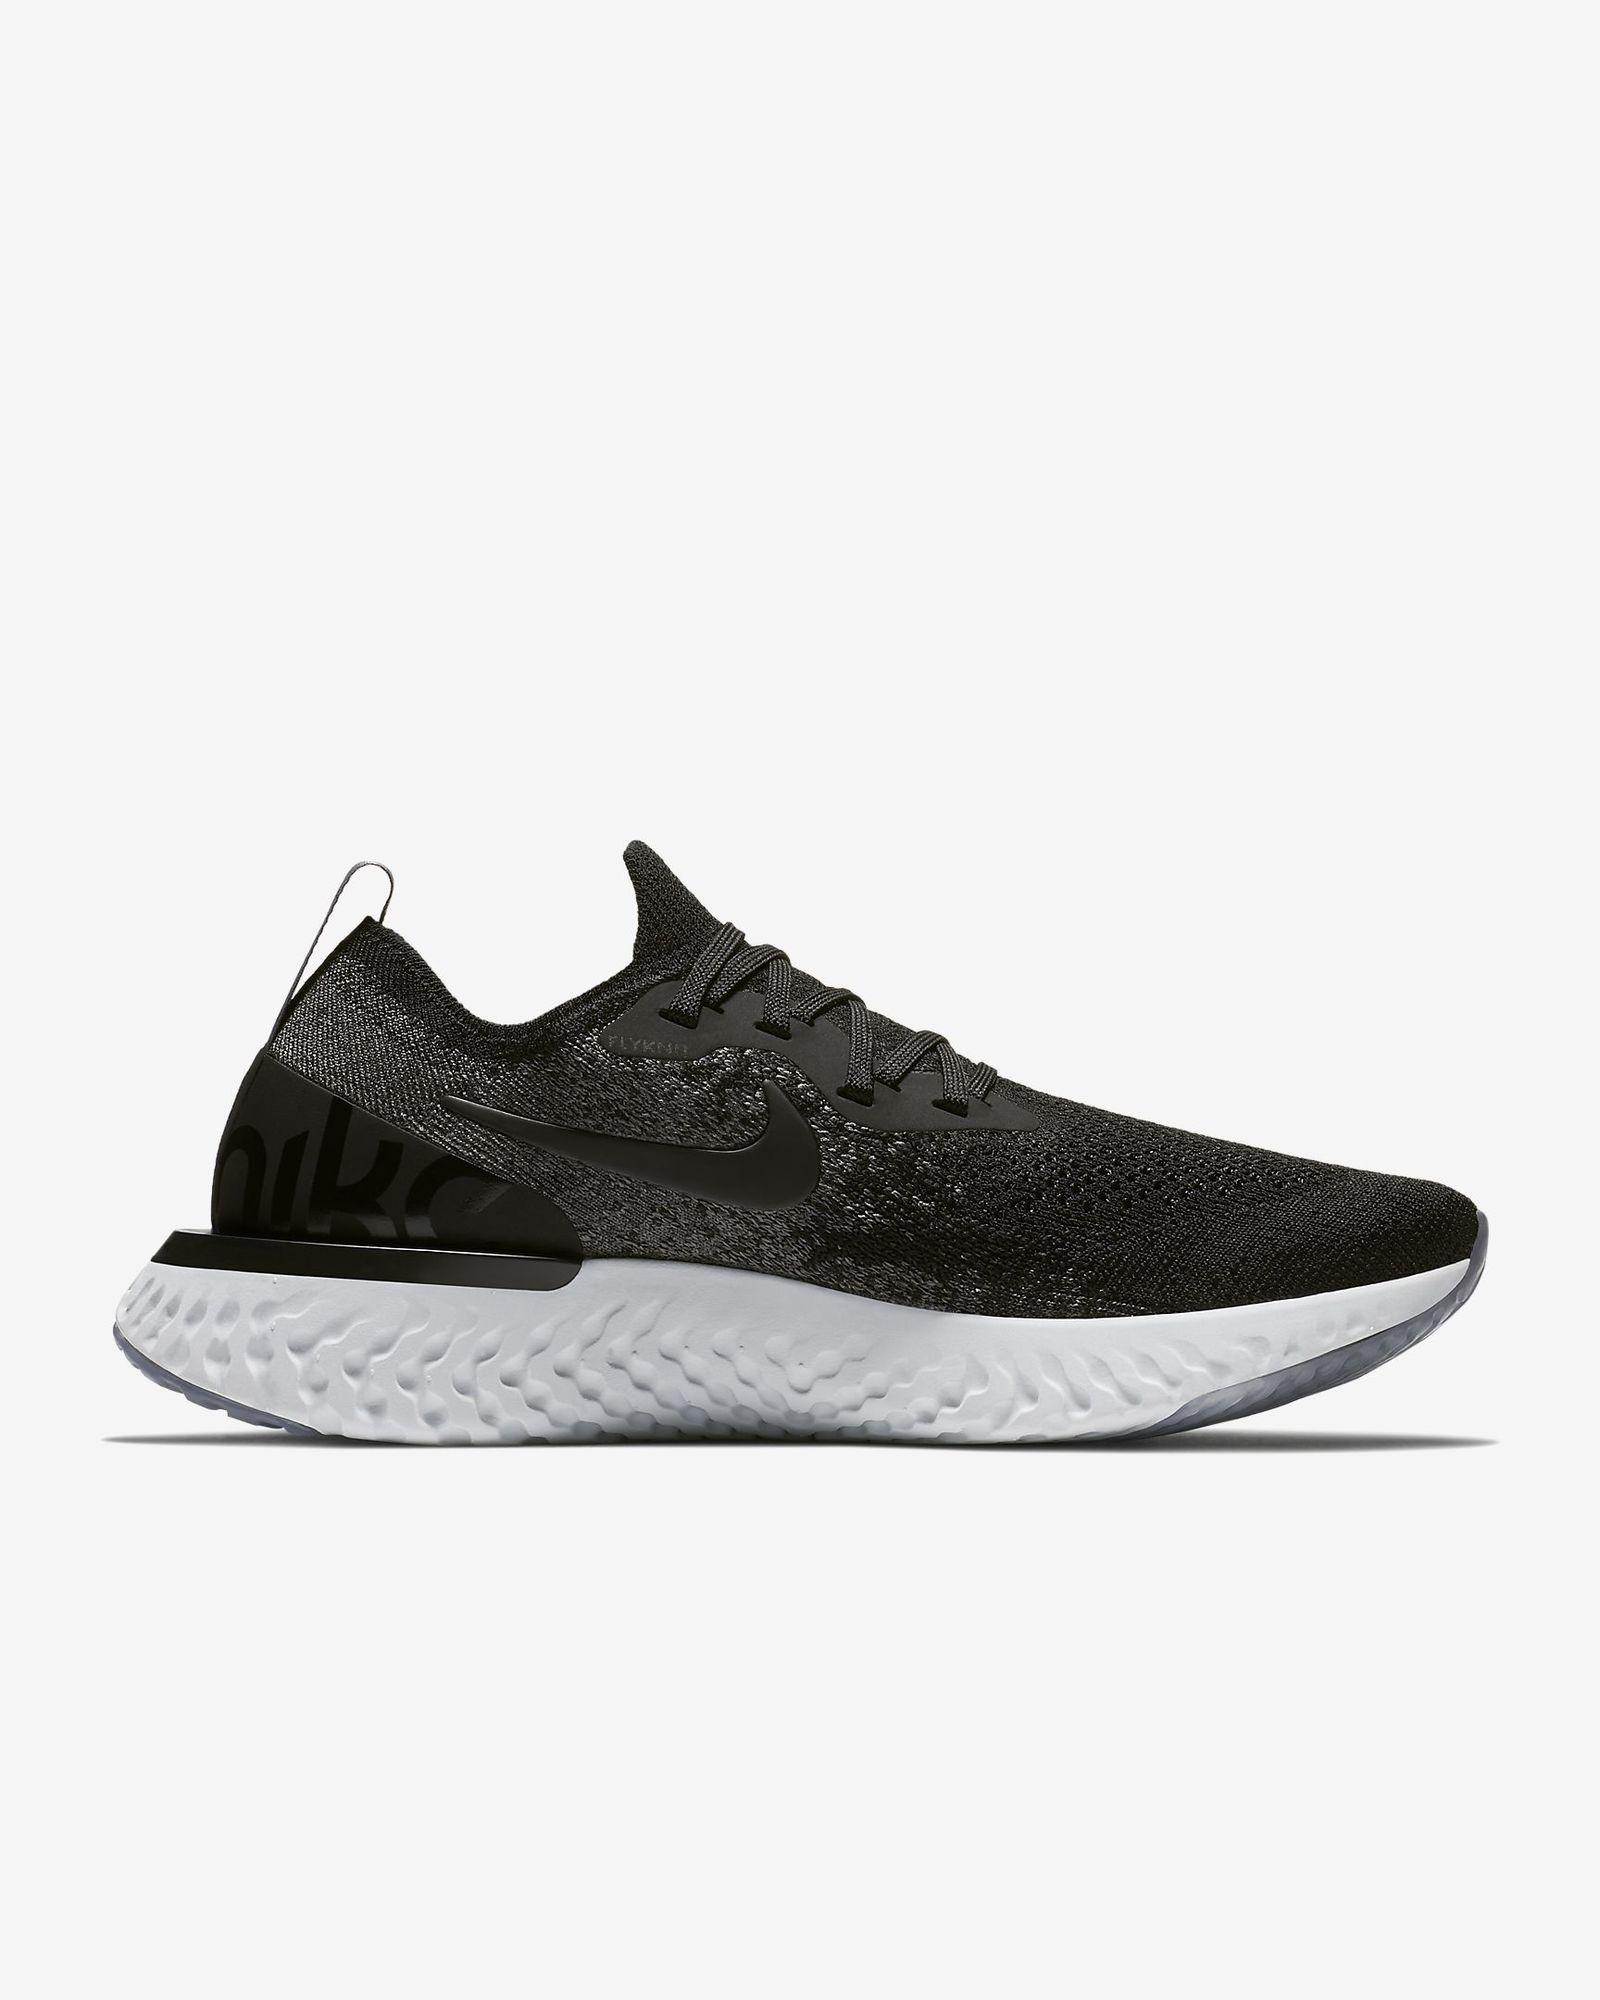 Nike Lady Epic React Flyknit in Schwarz Grau Platin